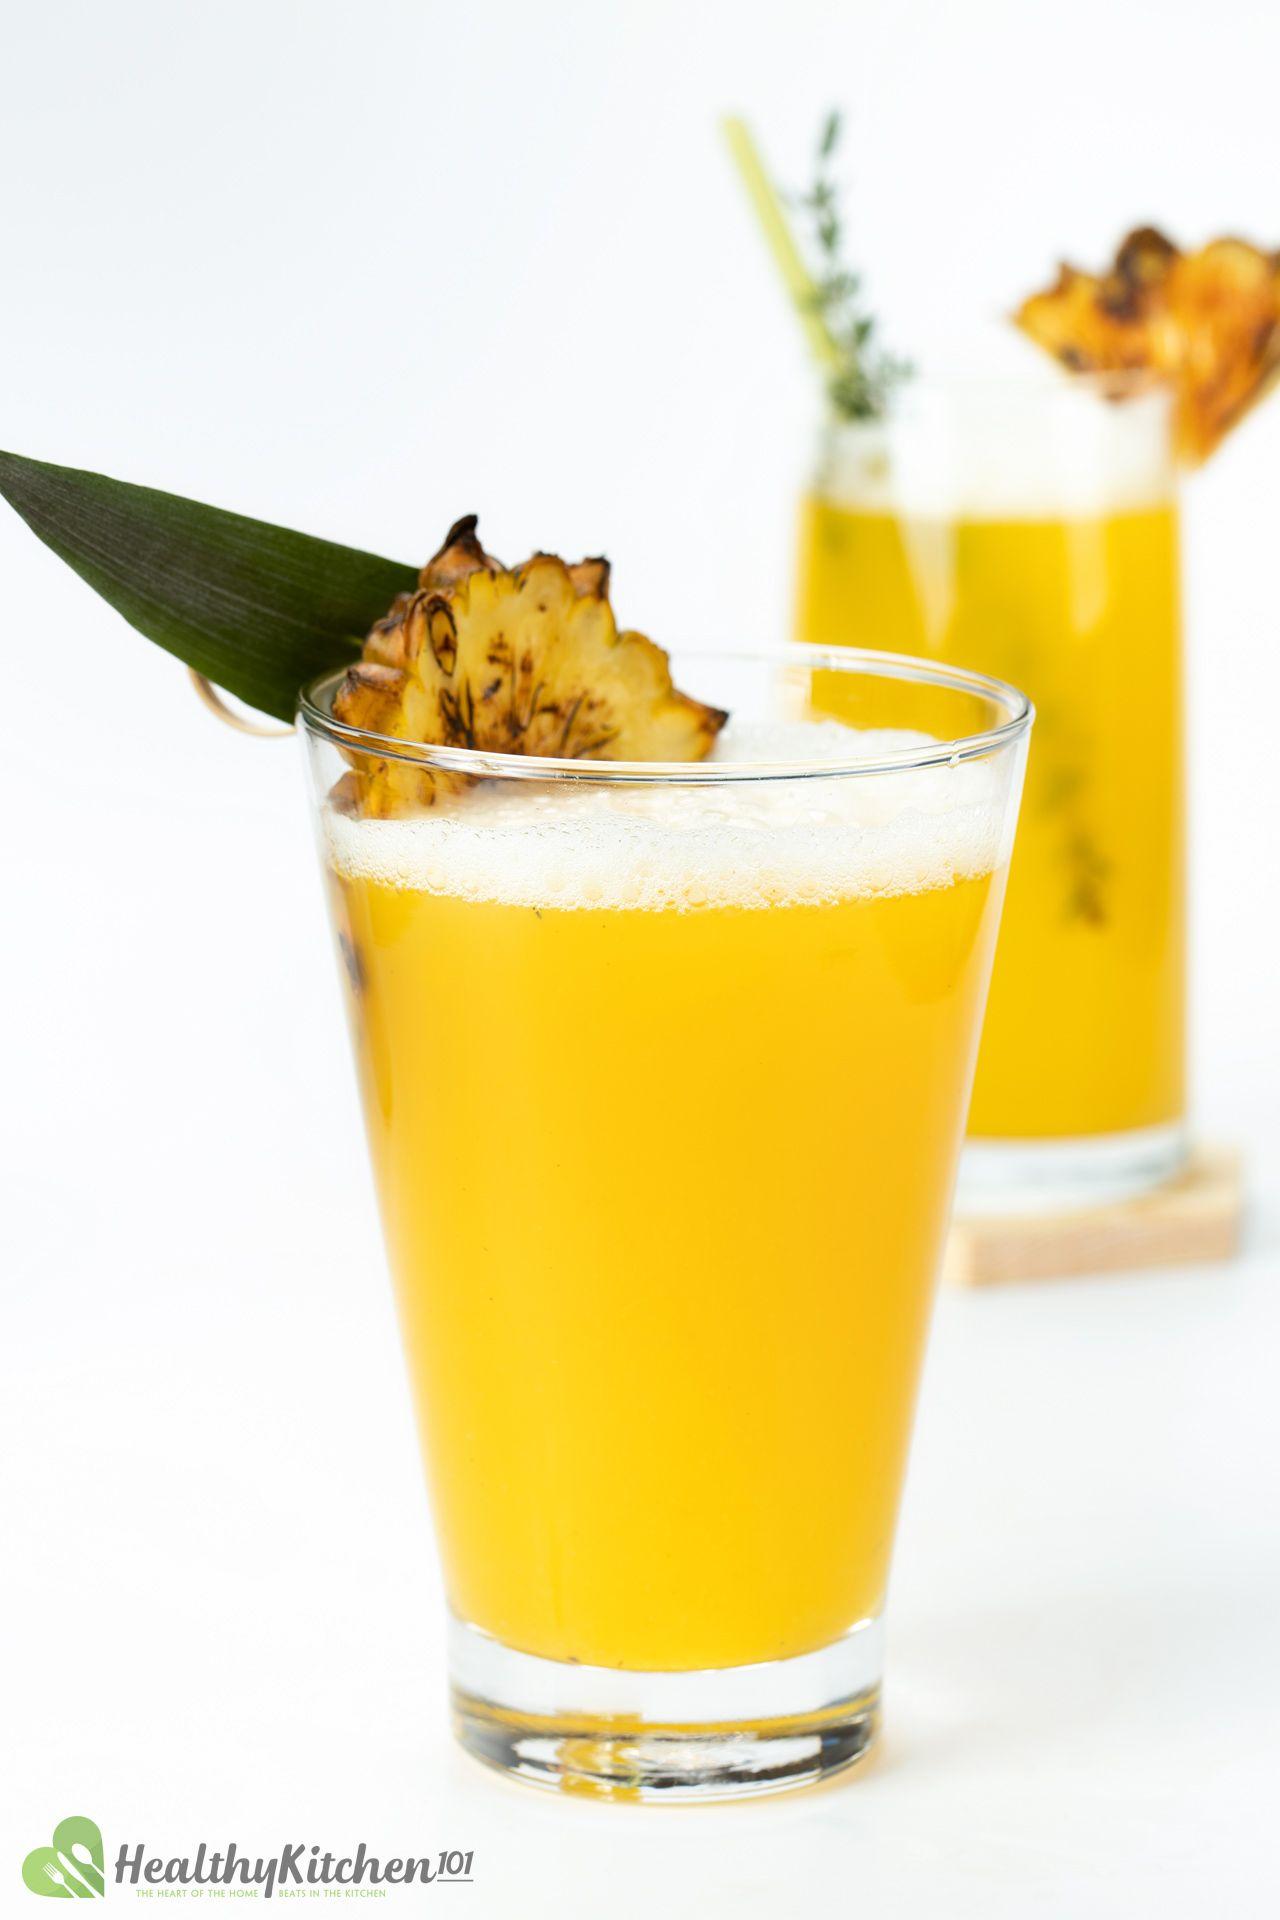 Homemade Vodka and Pineapple Juice Recipe